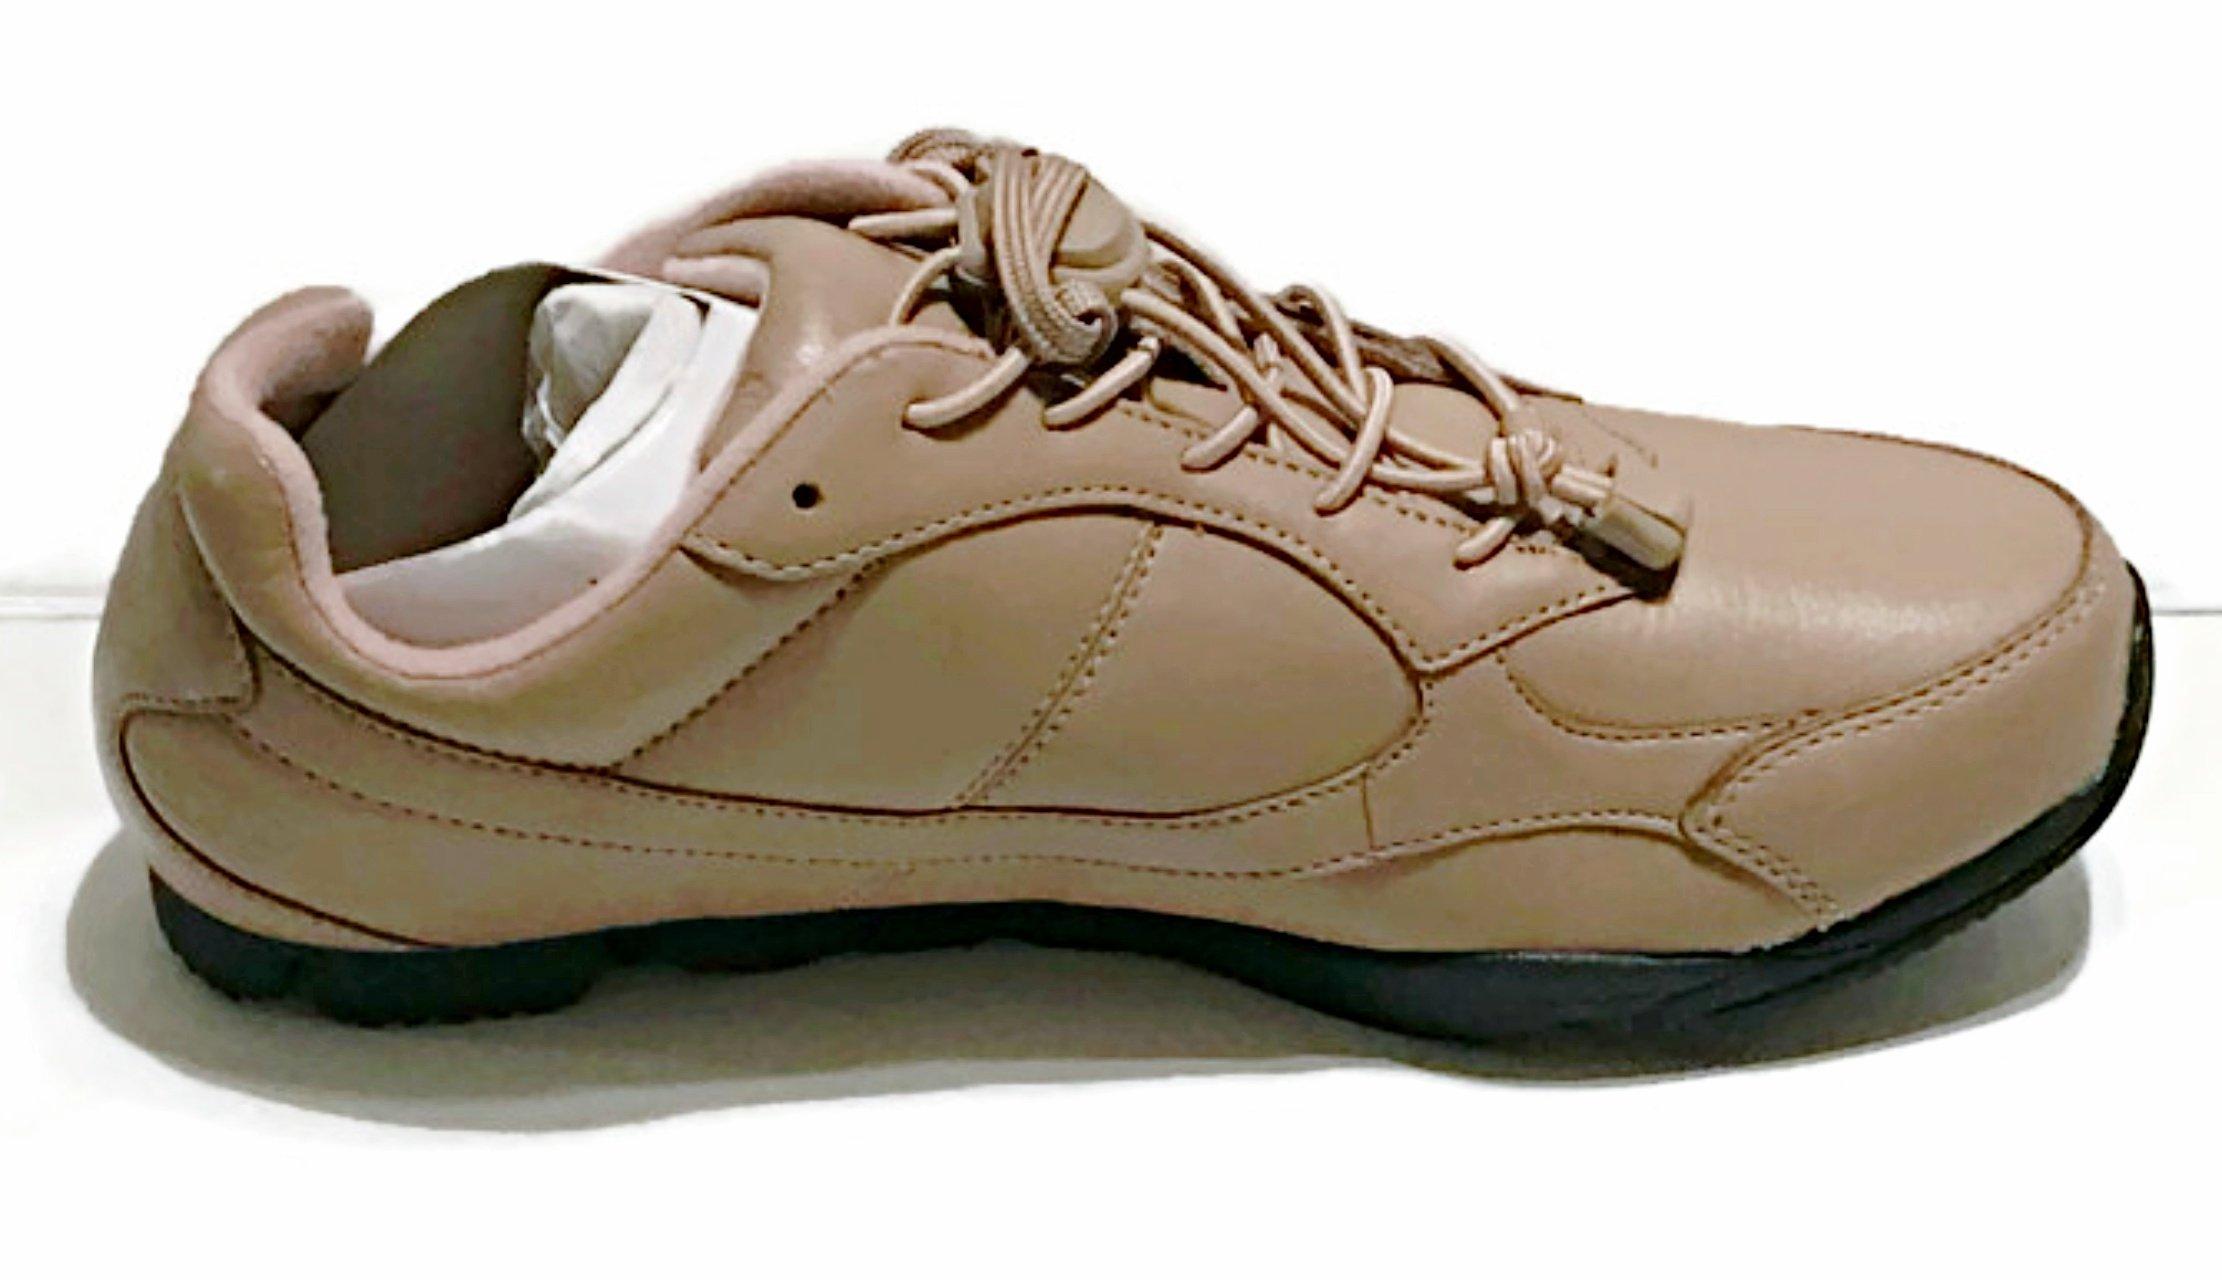 Dr. Comfort Women's Amy Taupe Flex OA Athletic Shoes - Size 9M/W